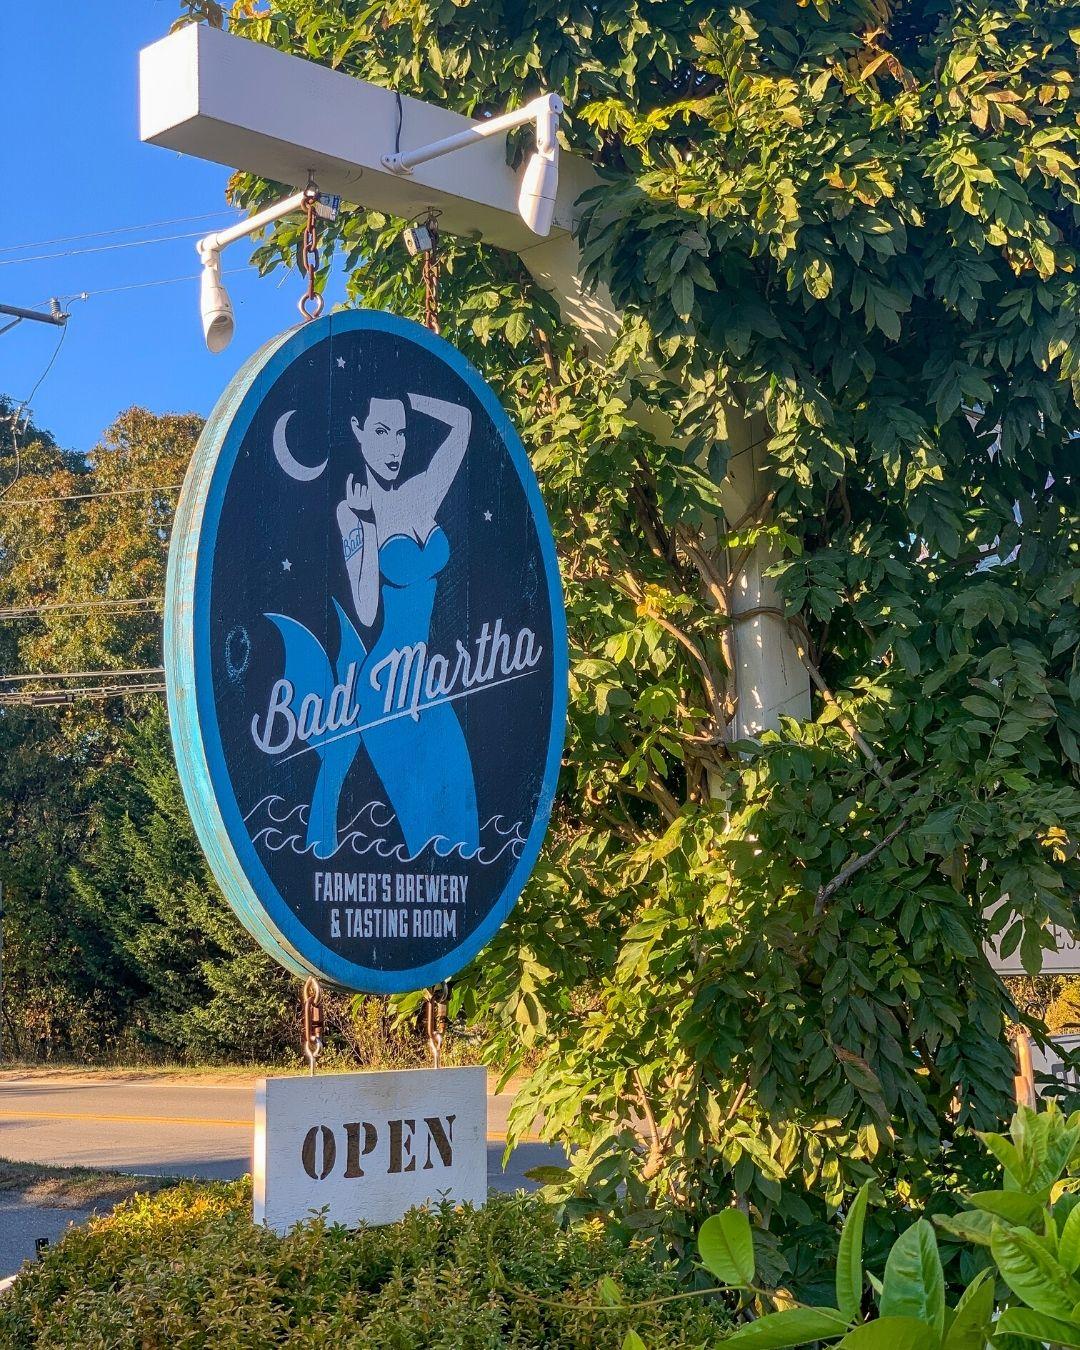 Bad Martha Farmers Brewery Edgartown-3